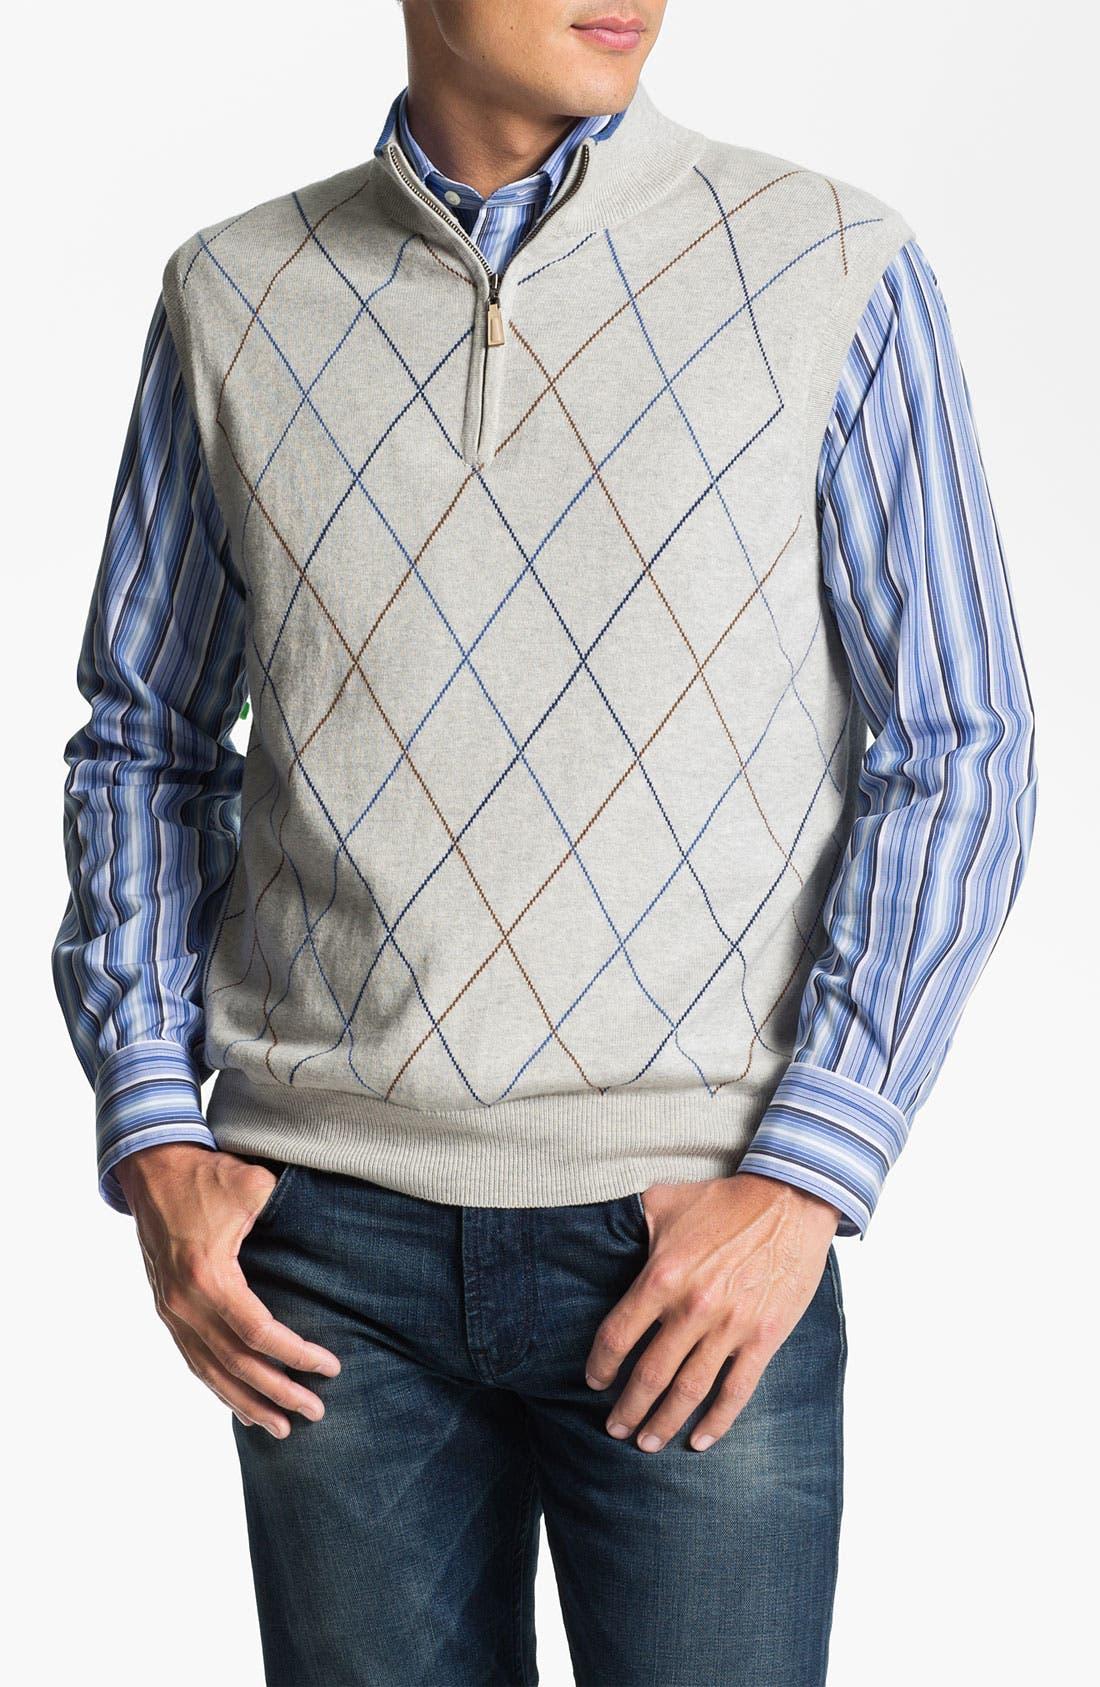 Main Image - Peter Millar Quarter Zip Cotton & Cashmere Sweater Vest